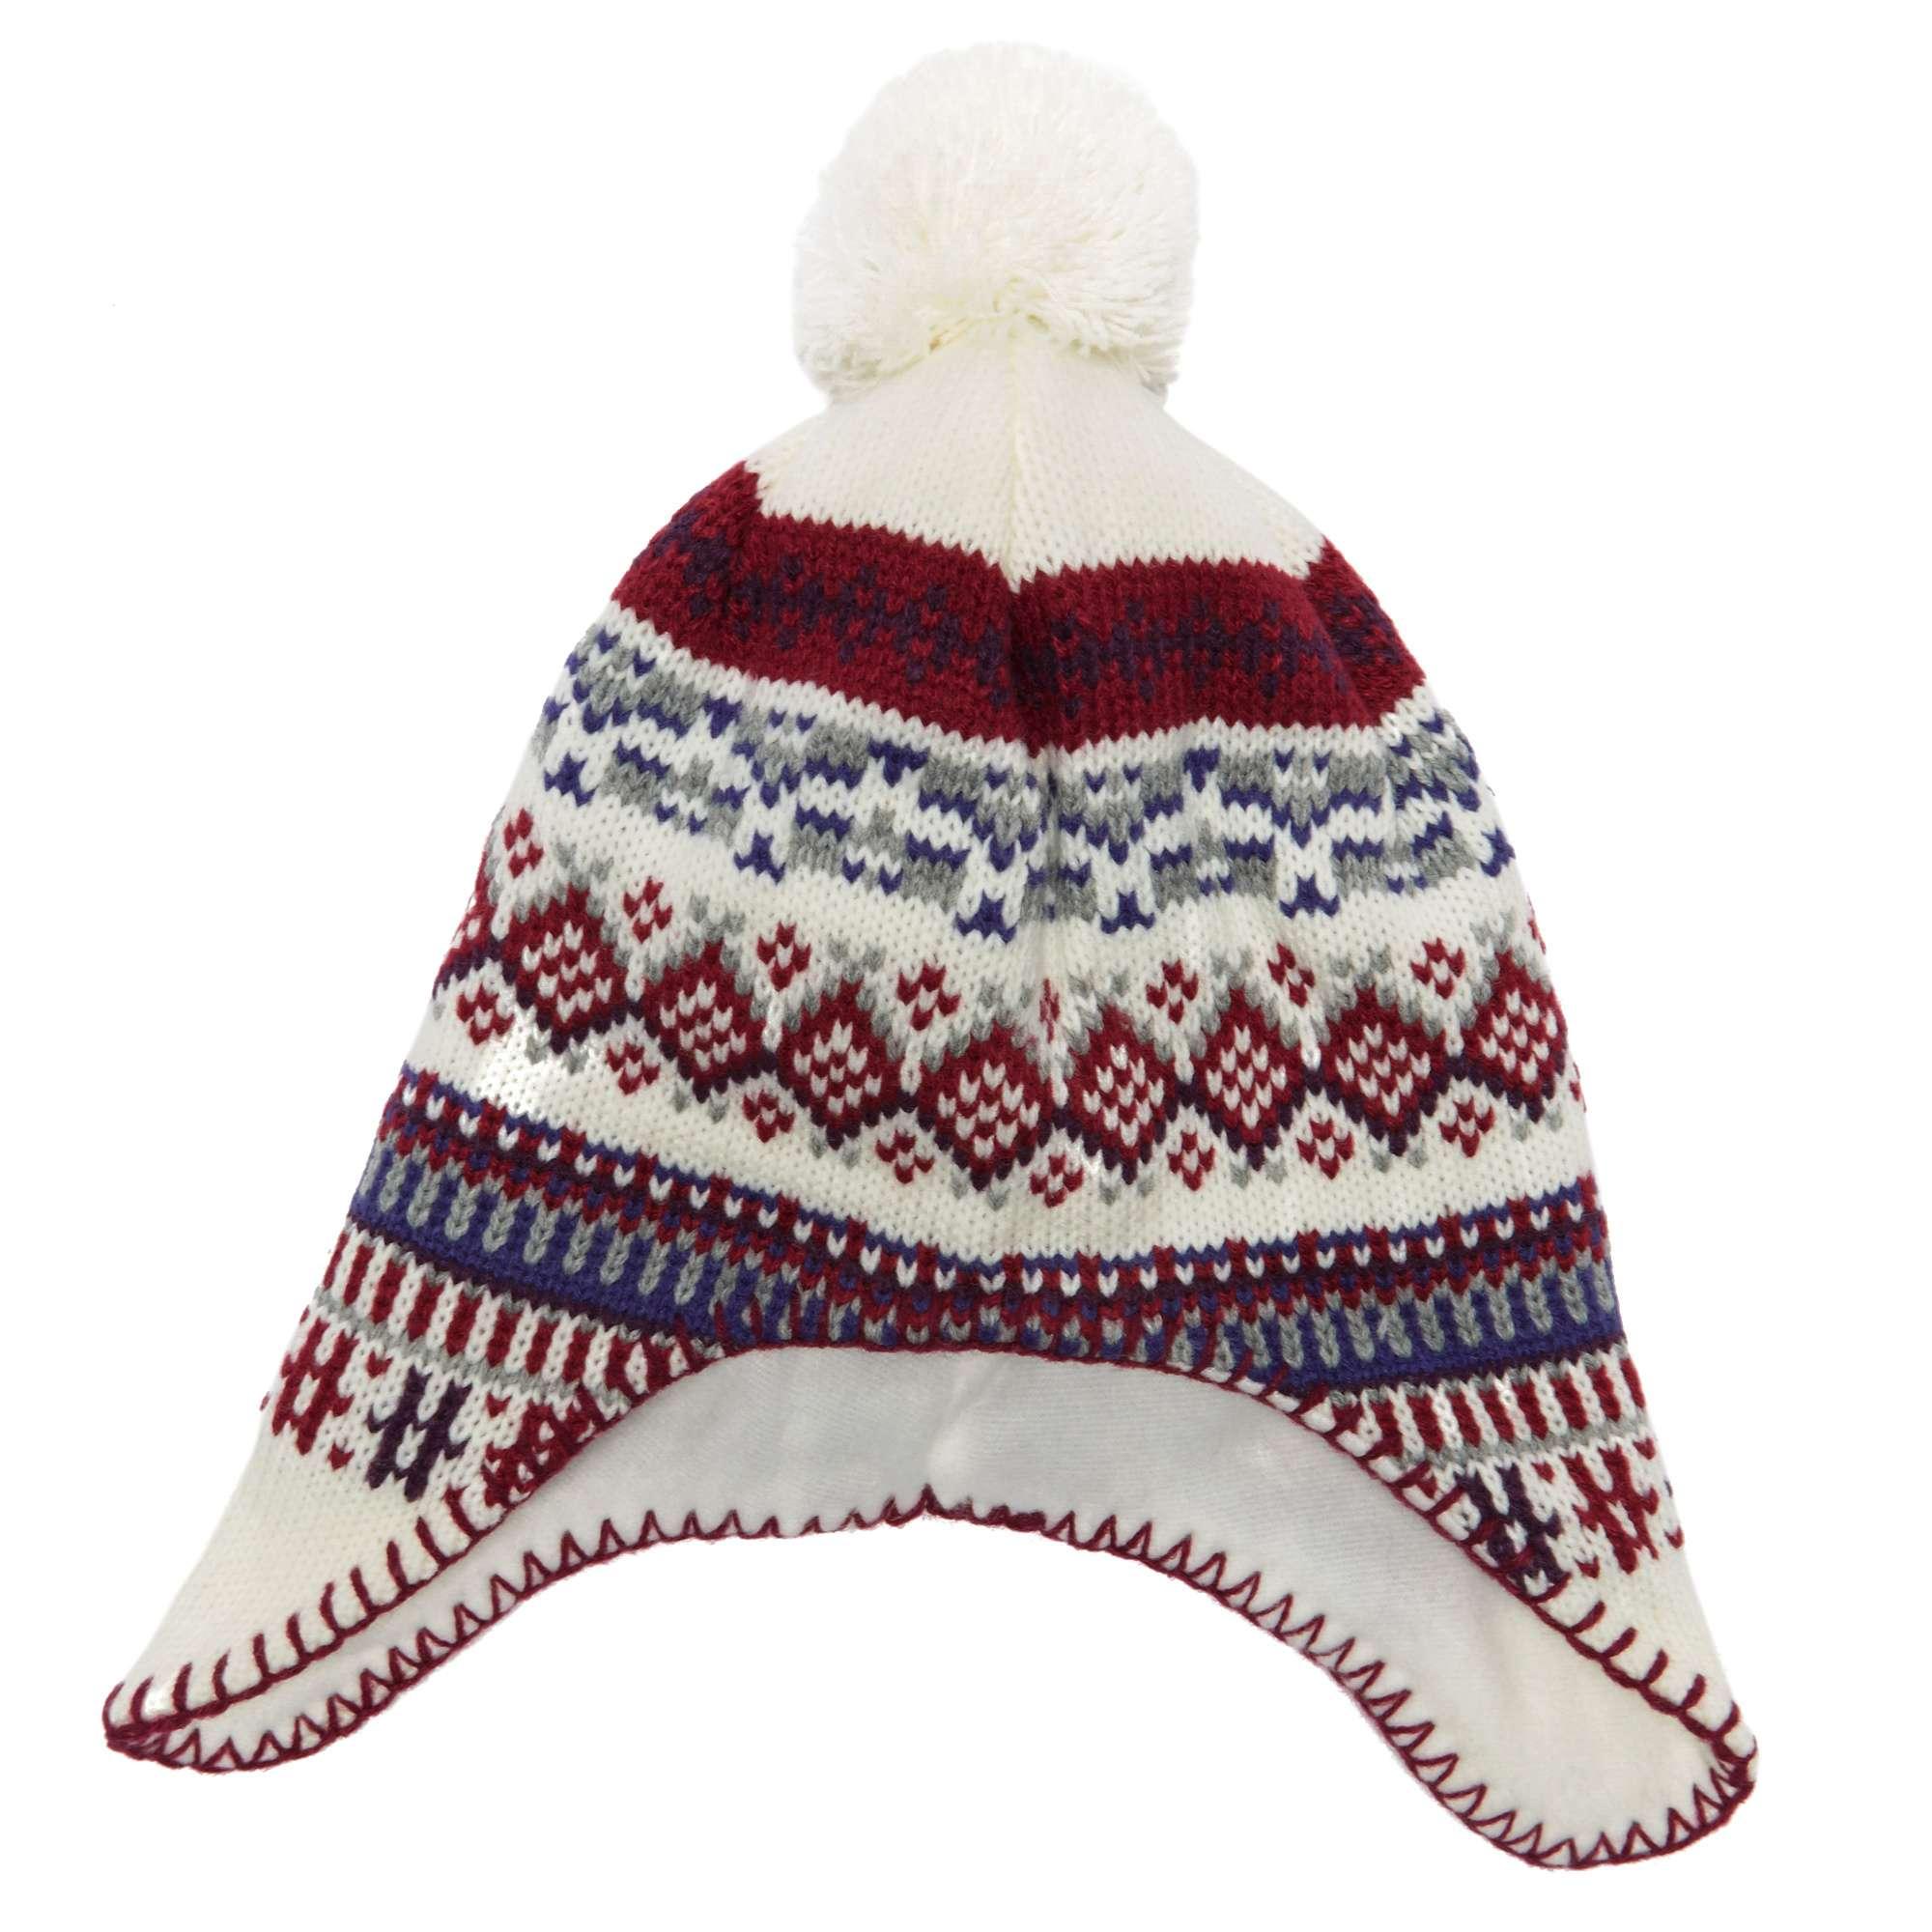 ALPINE Girls' Jacquard Ear Flap Hat